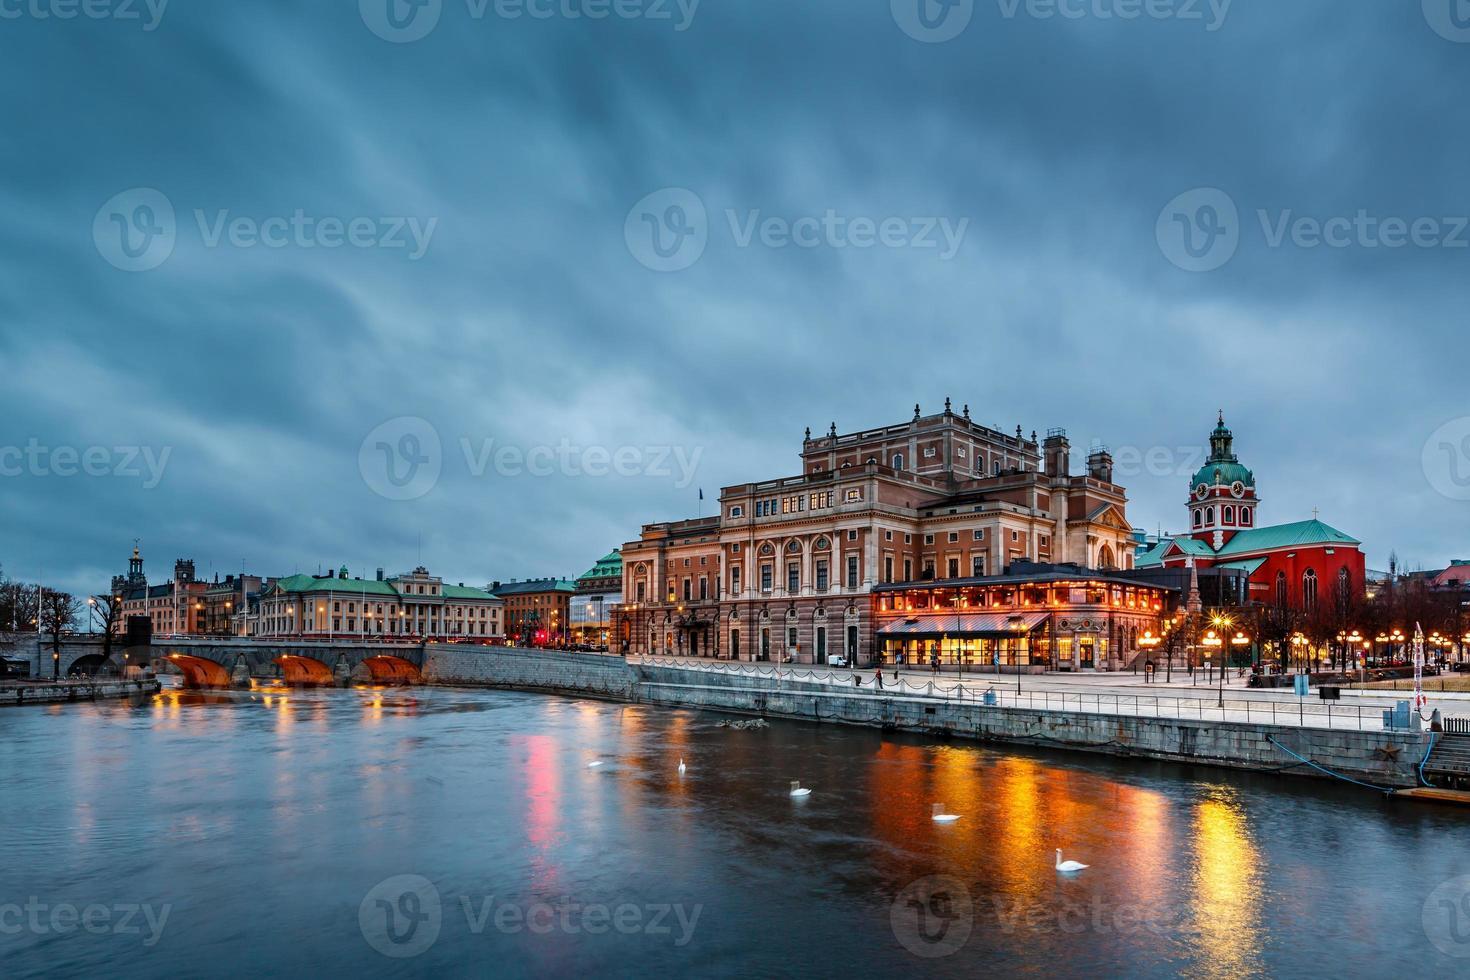 ópera real de Estocolmo iluminada à noite, Suécia foto